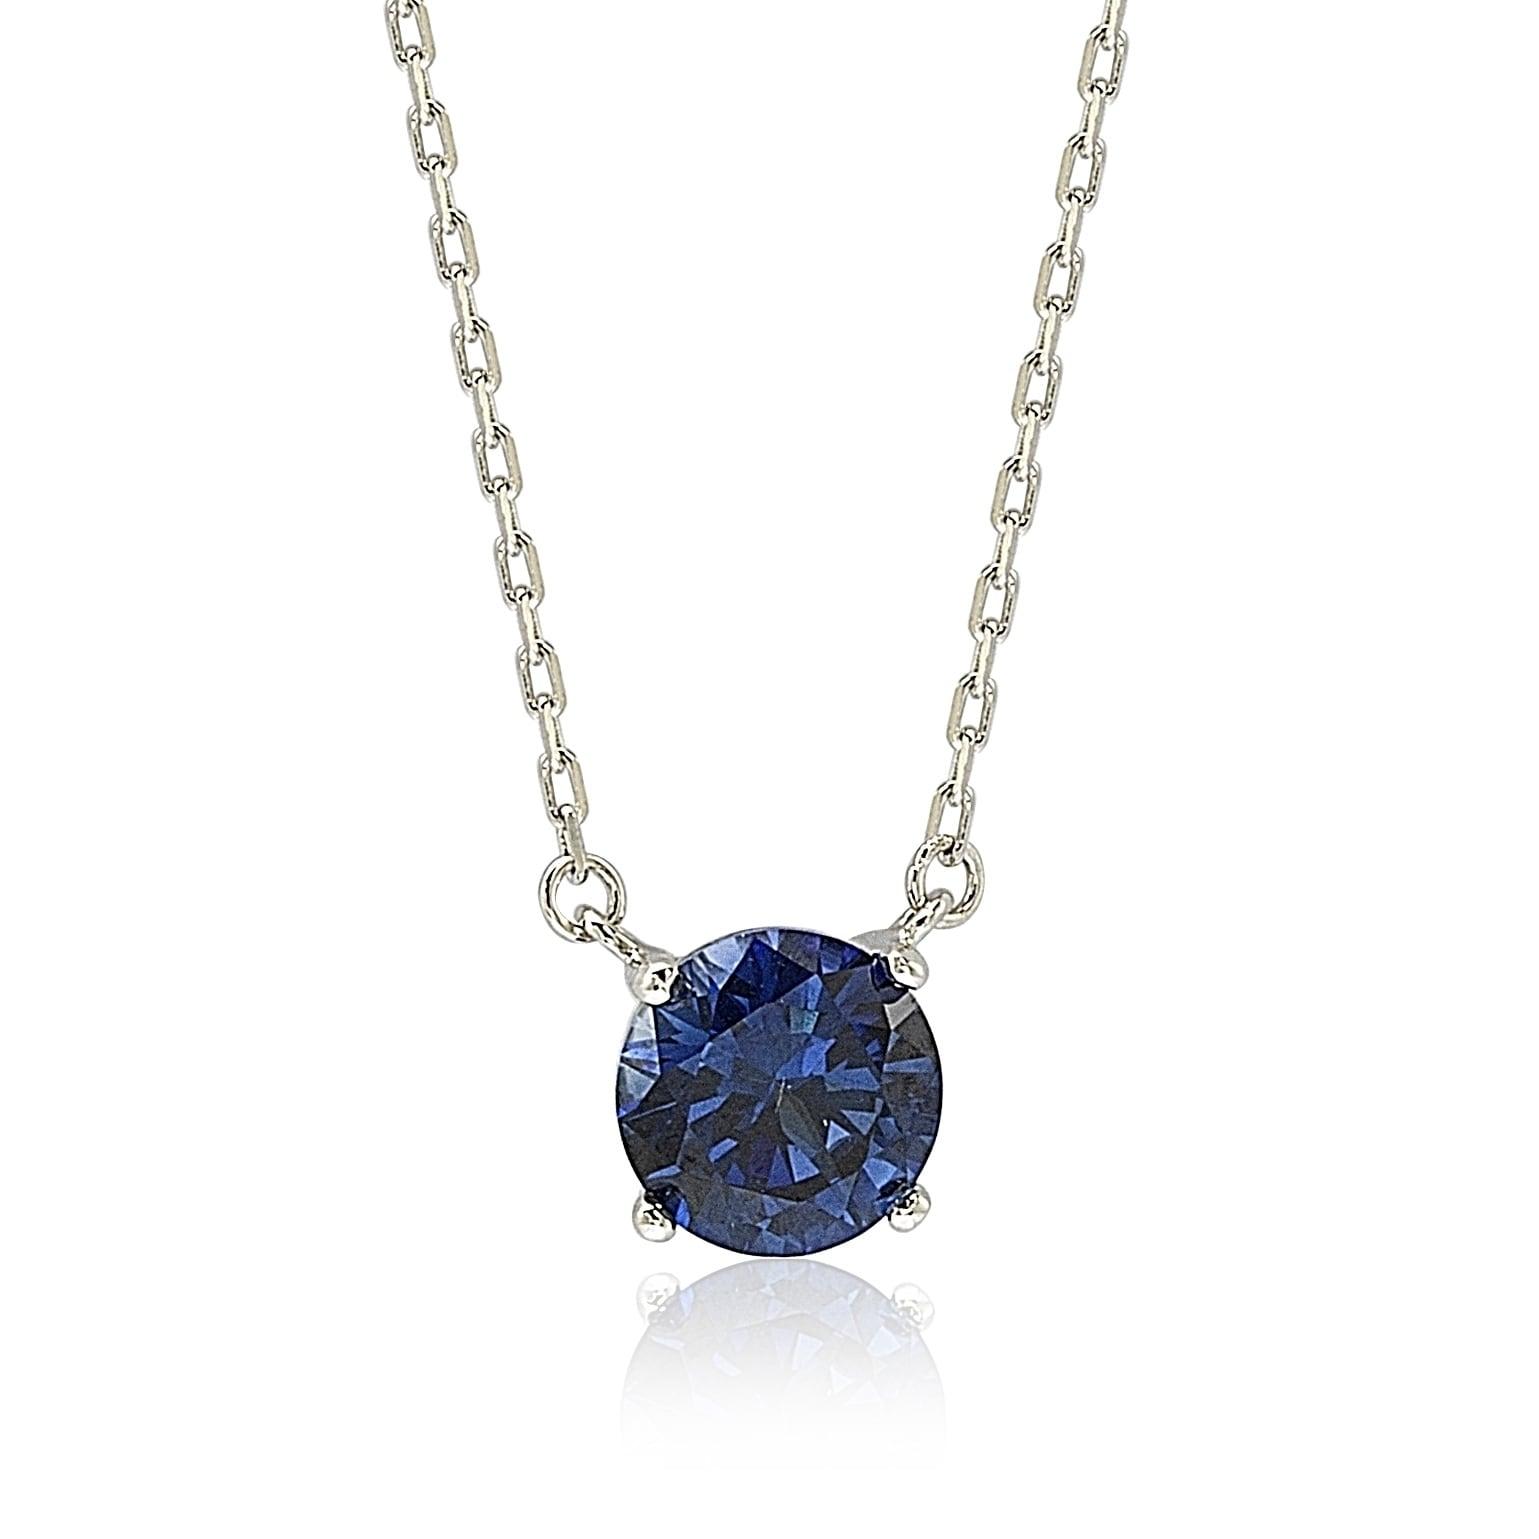 f83287ece1602 Suzy Levian Sterling Silver Blue Sapphire Solitaire Necklace